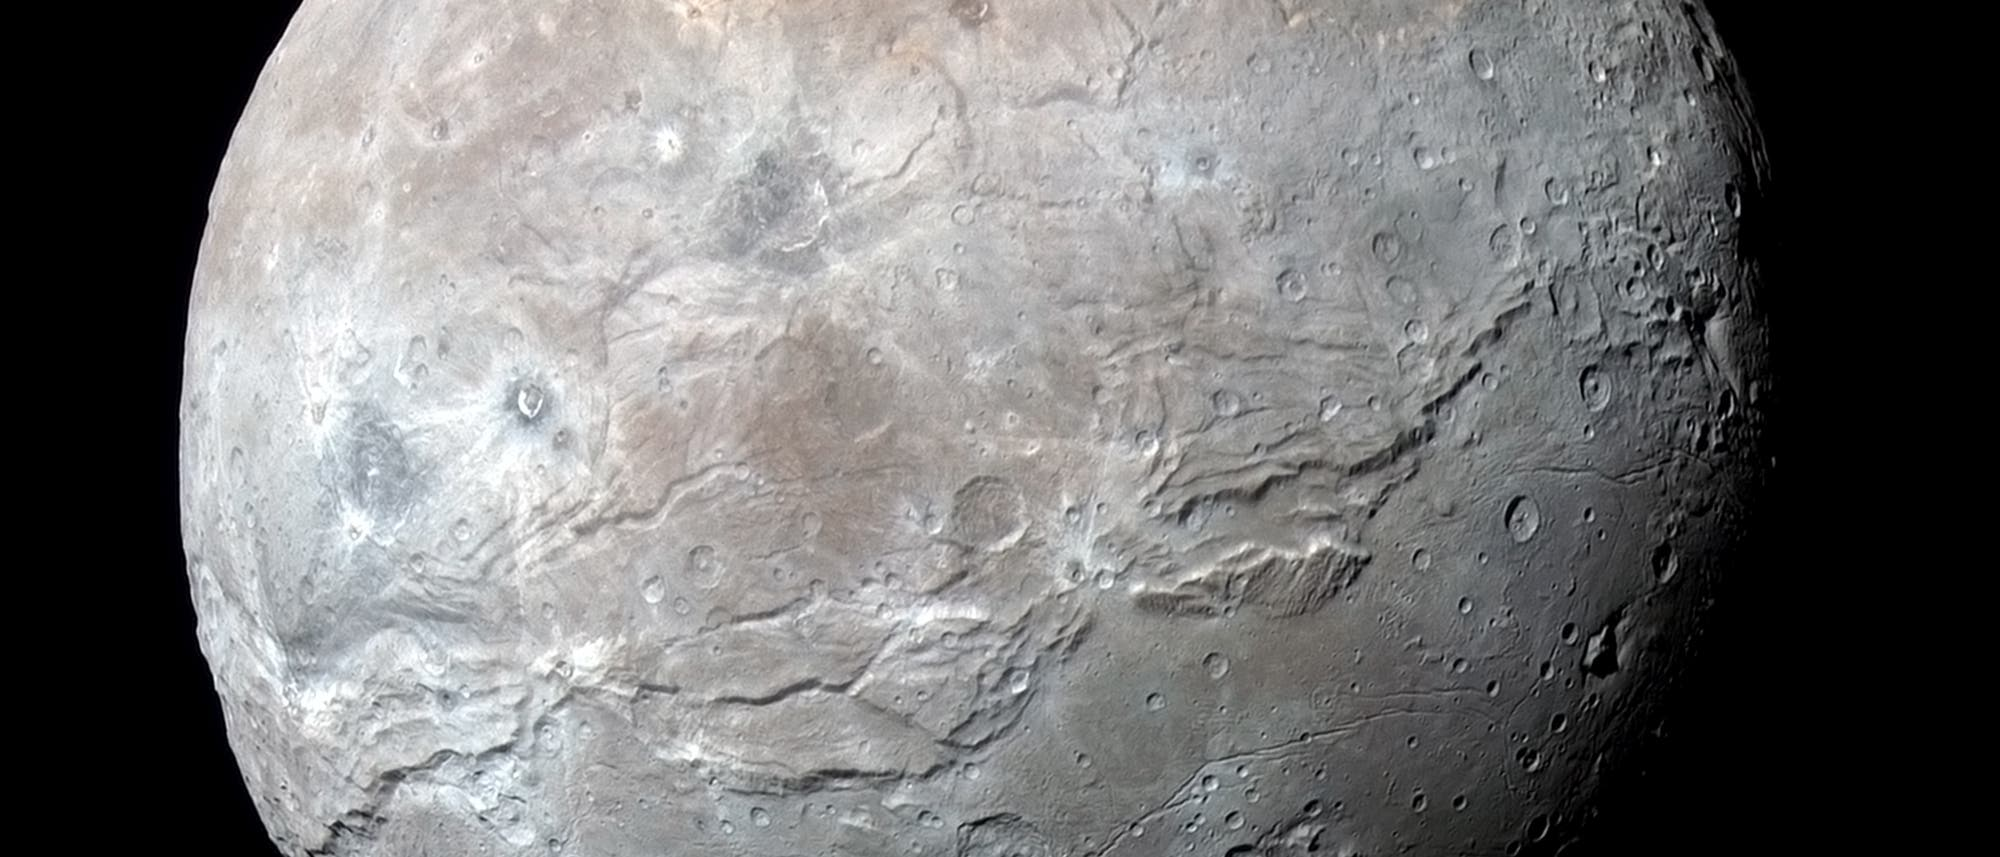 Plutomond Charon im Detail